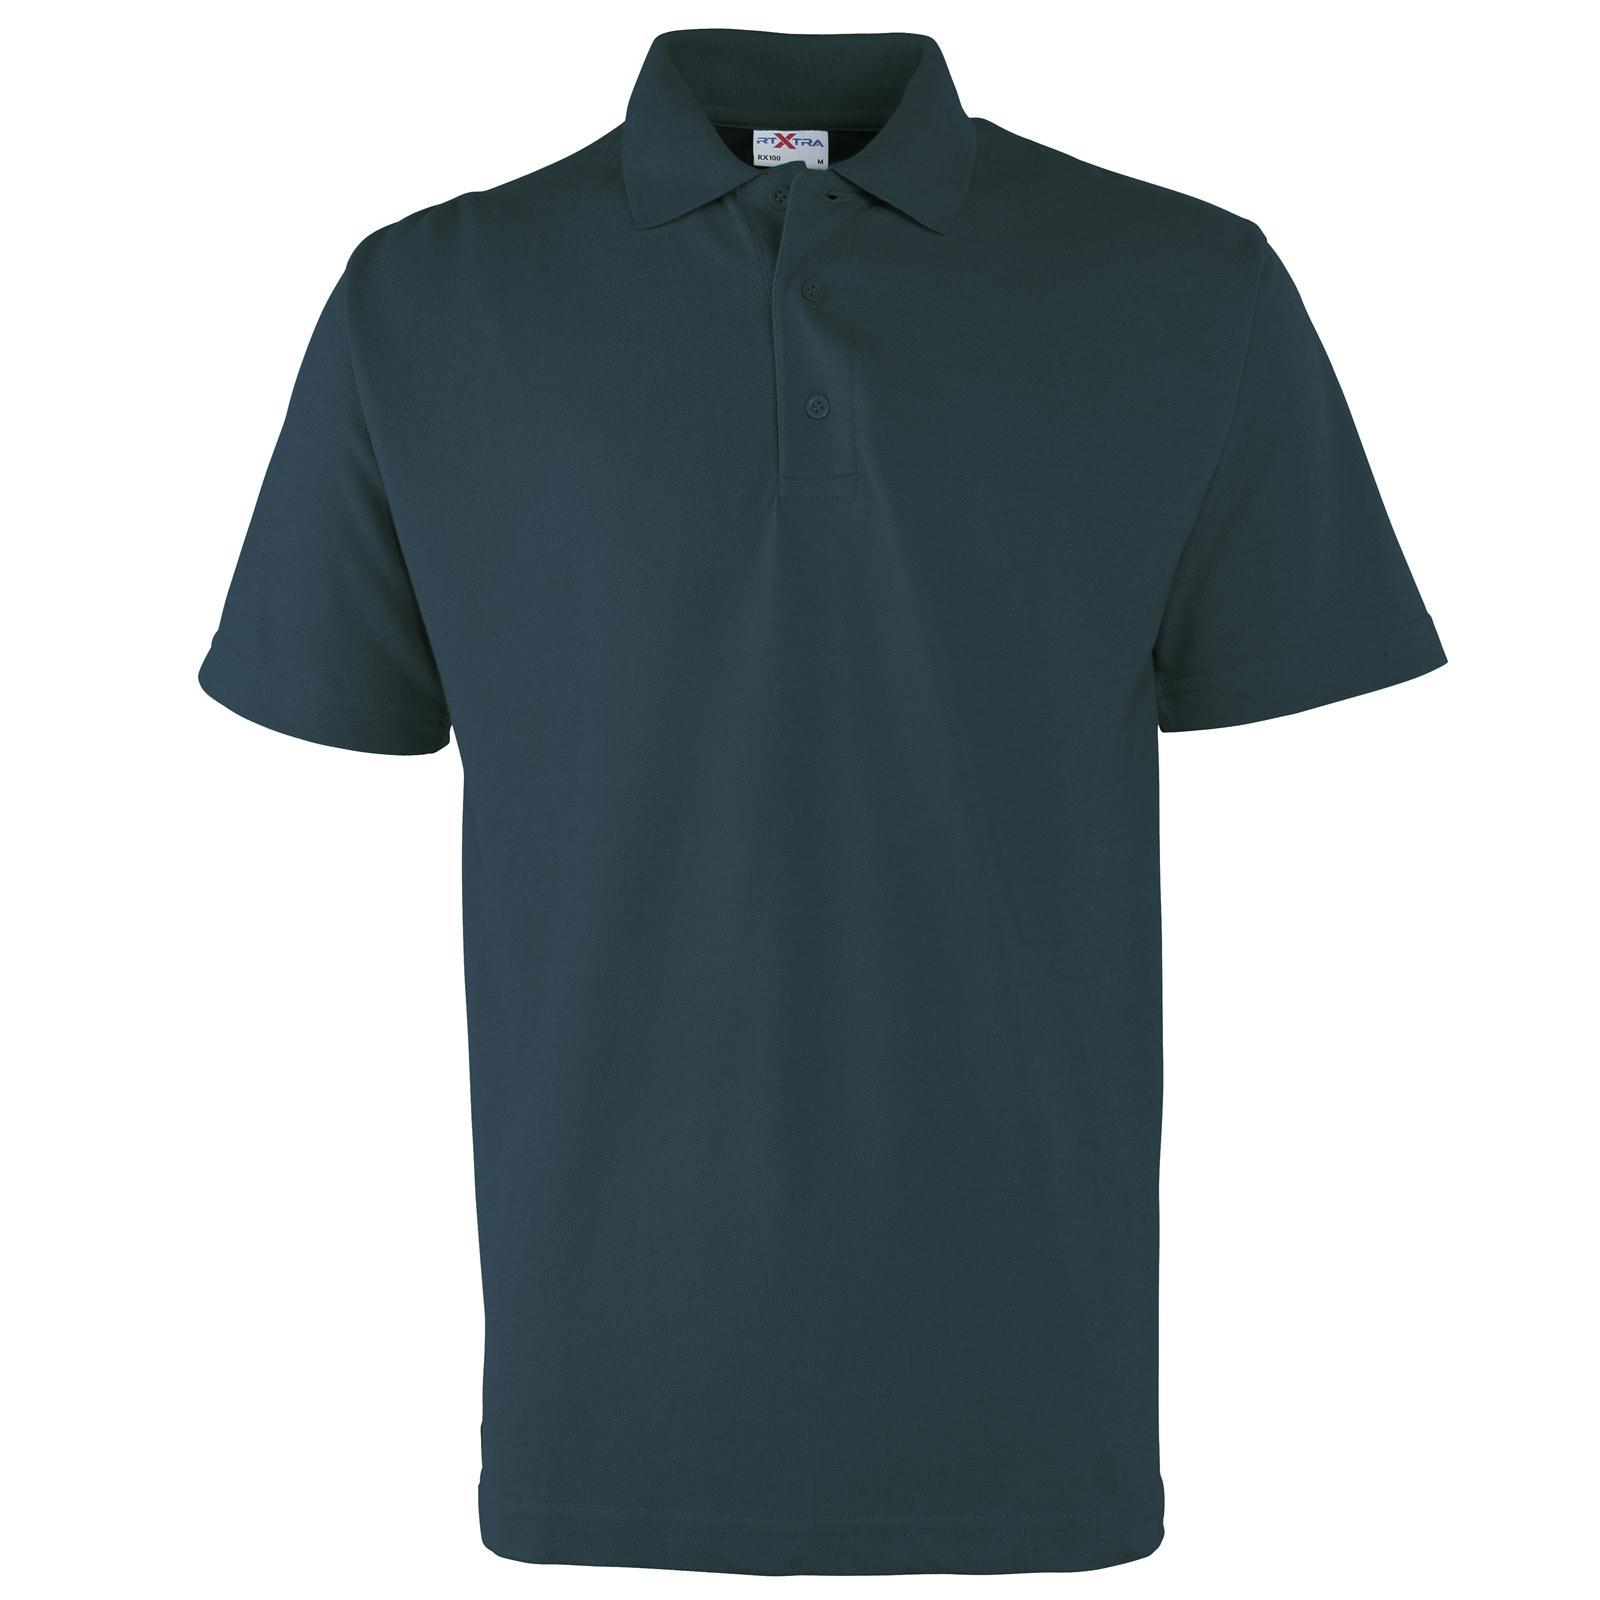 new rtxtra mens casual classic 3 button pique polo shirt